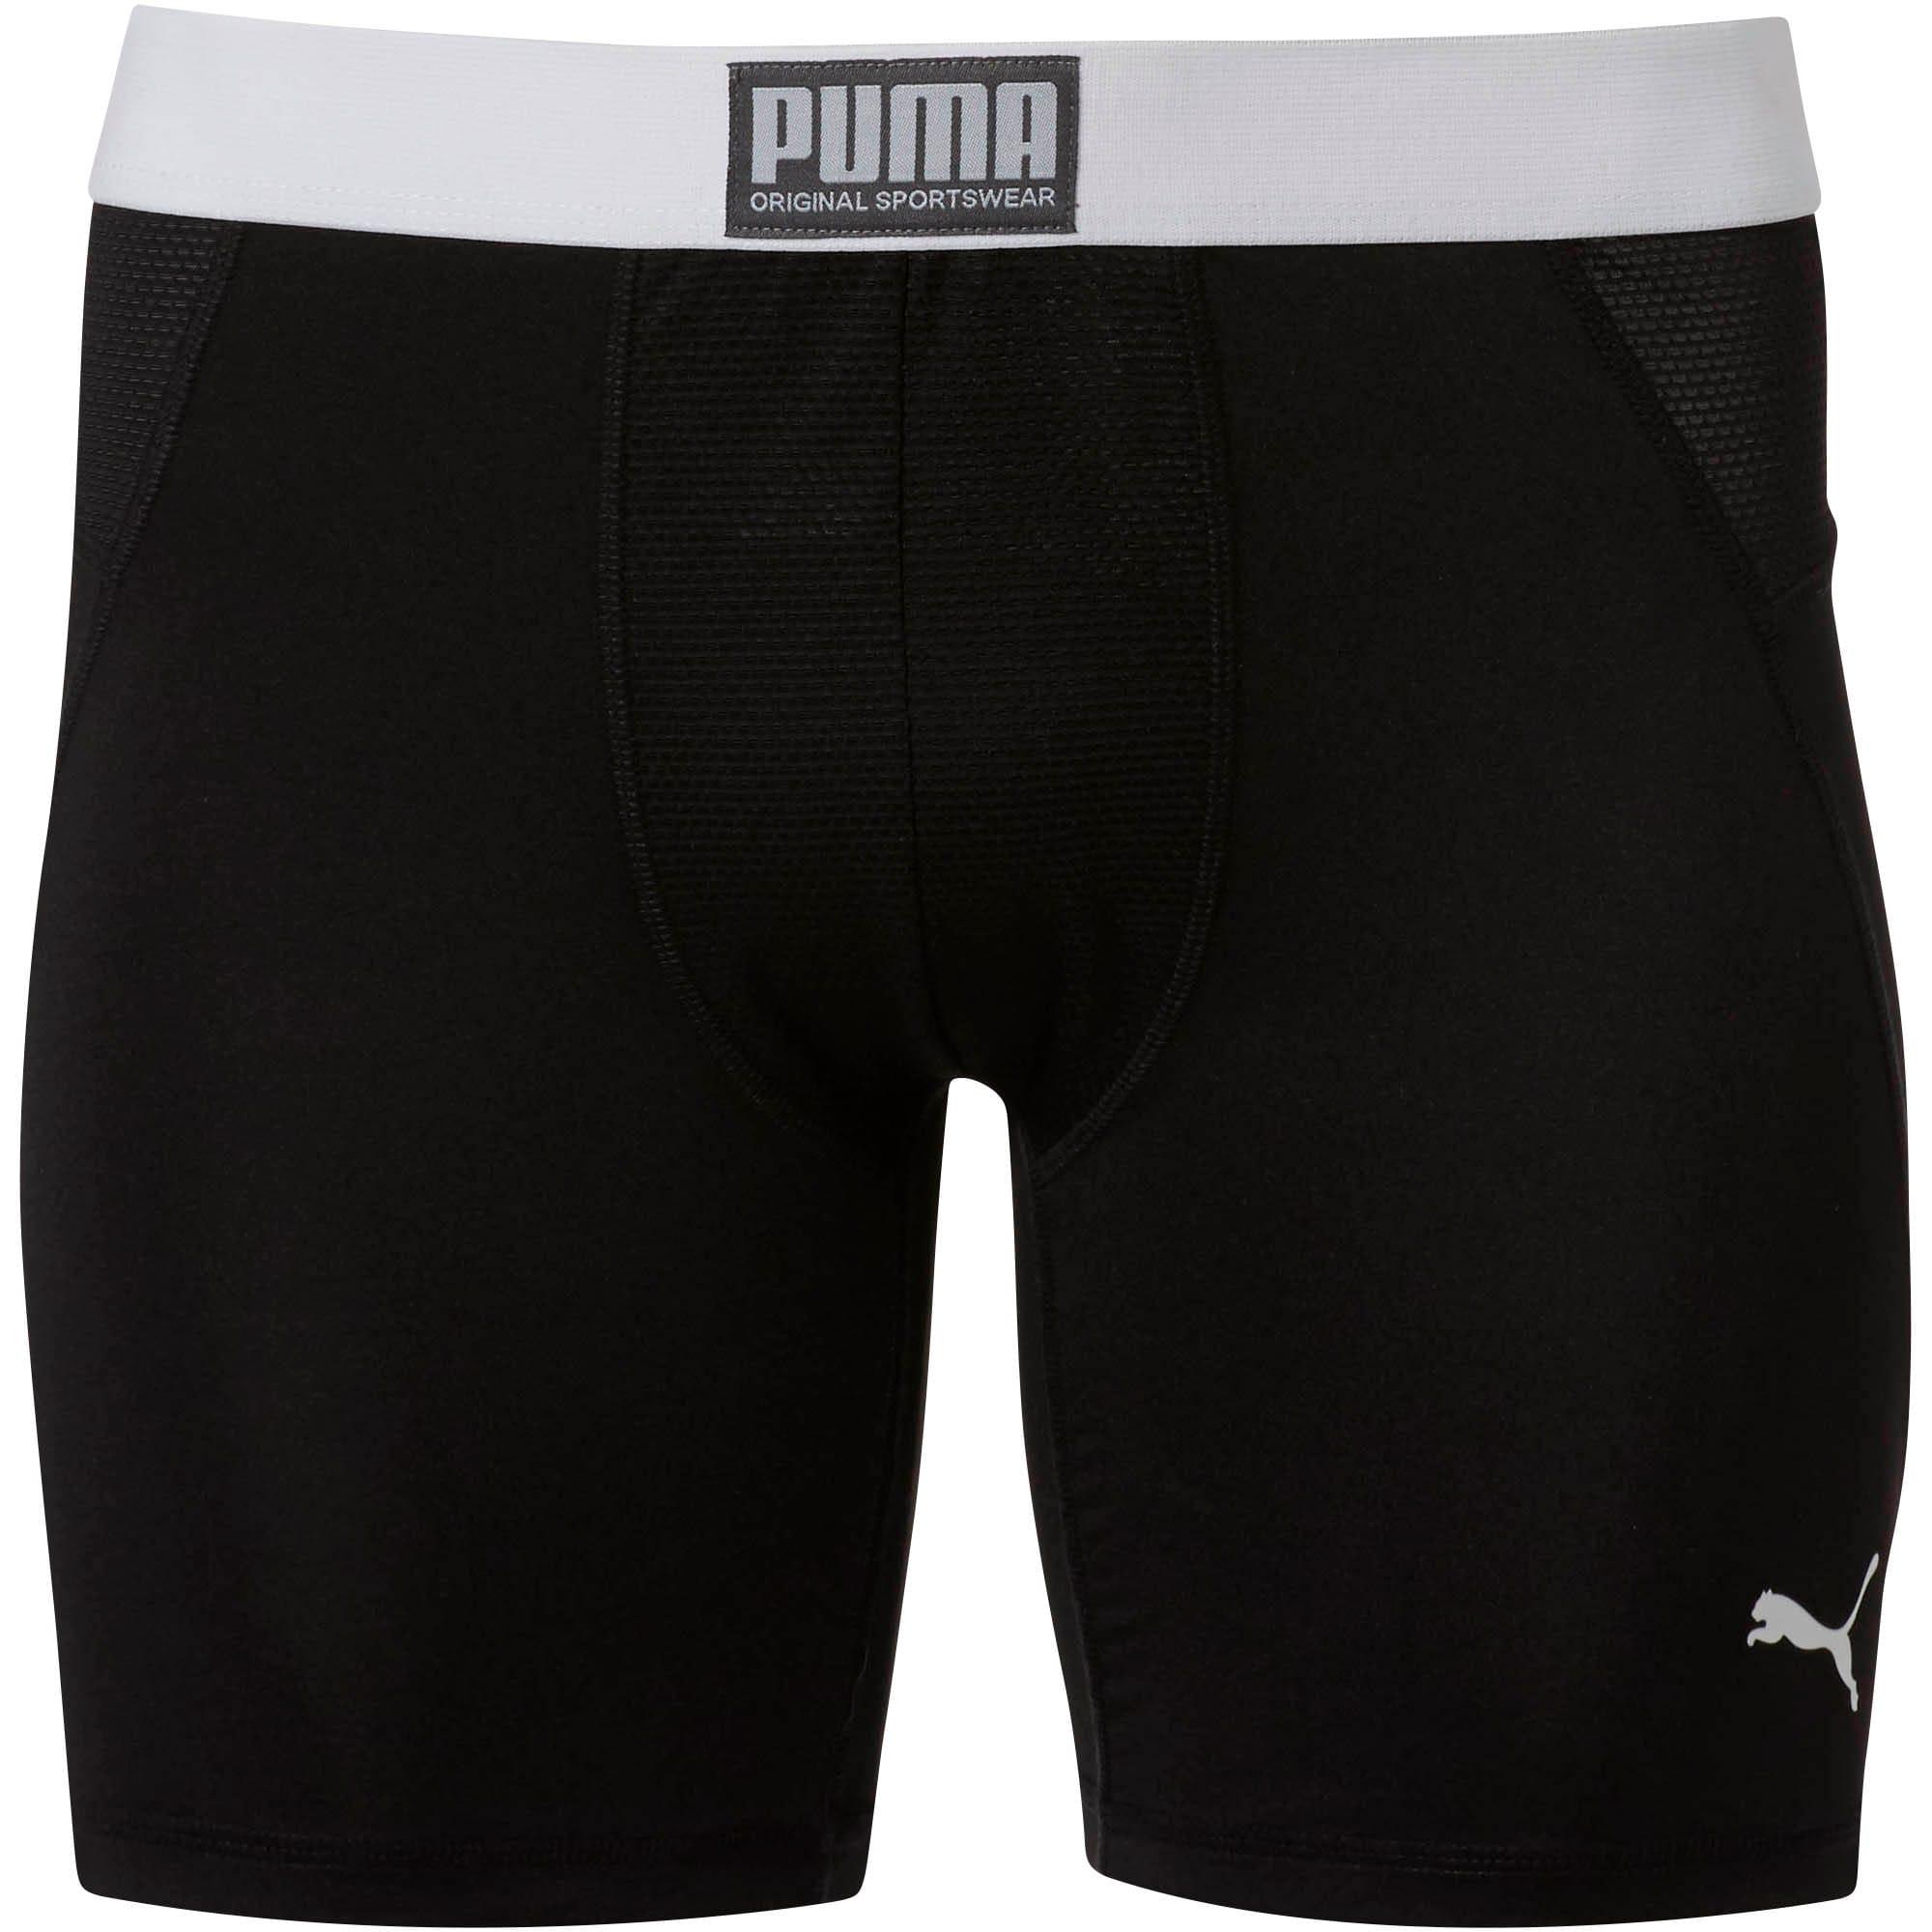 Thumbnail 3 of Men's Flex Cool Performance Boxer Brief [2 Pack], RED / BLACK, medium